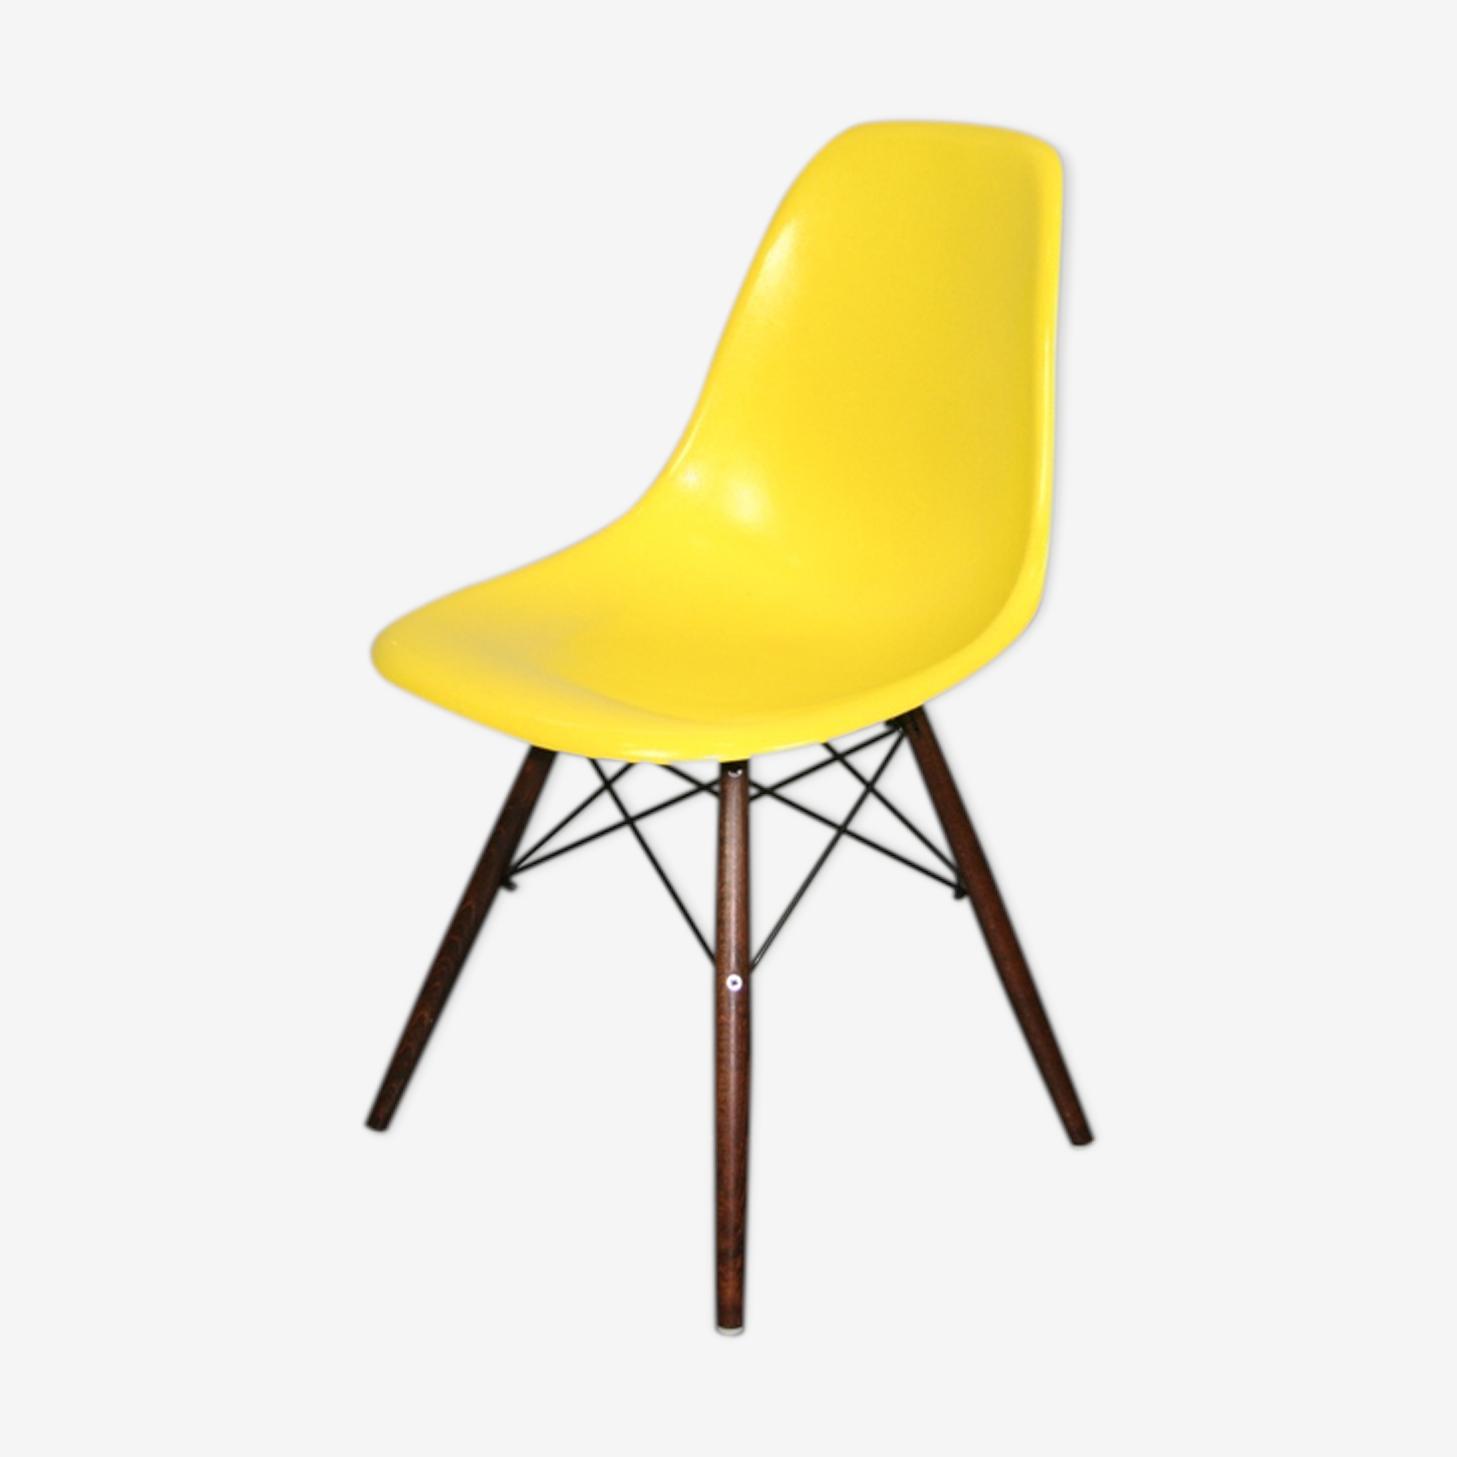 Chaise dsw jaune Eames Herman Miller vintage noyer